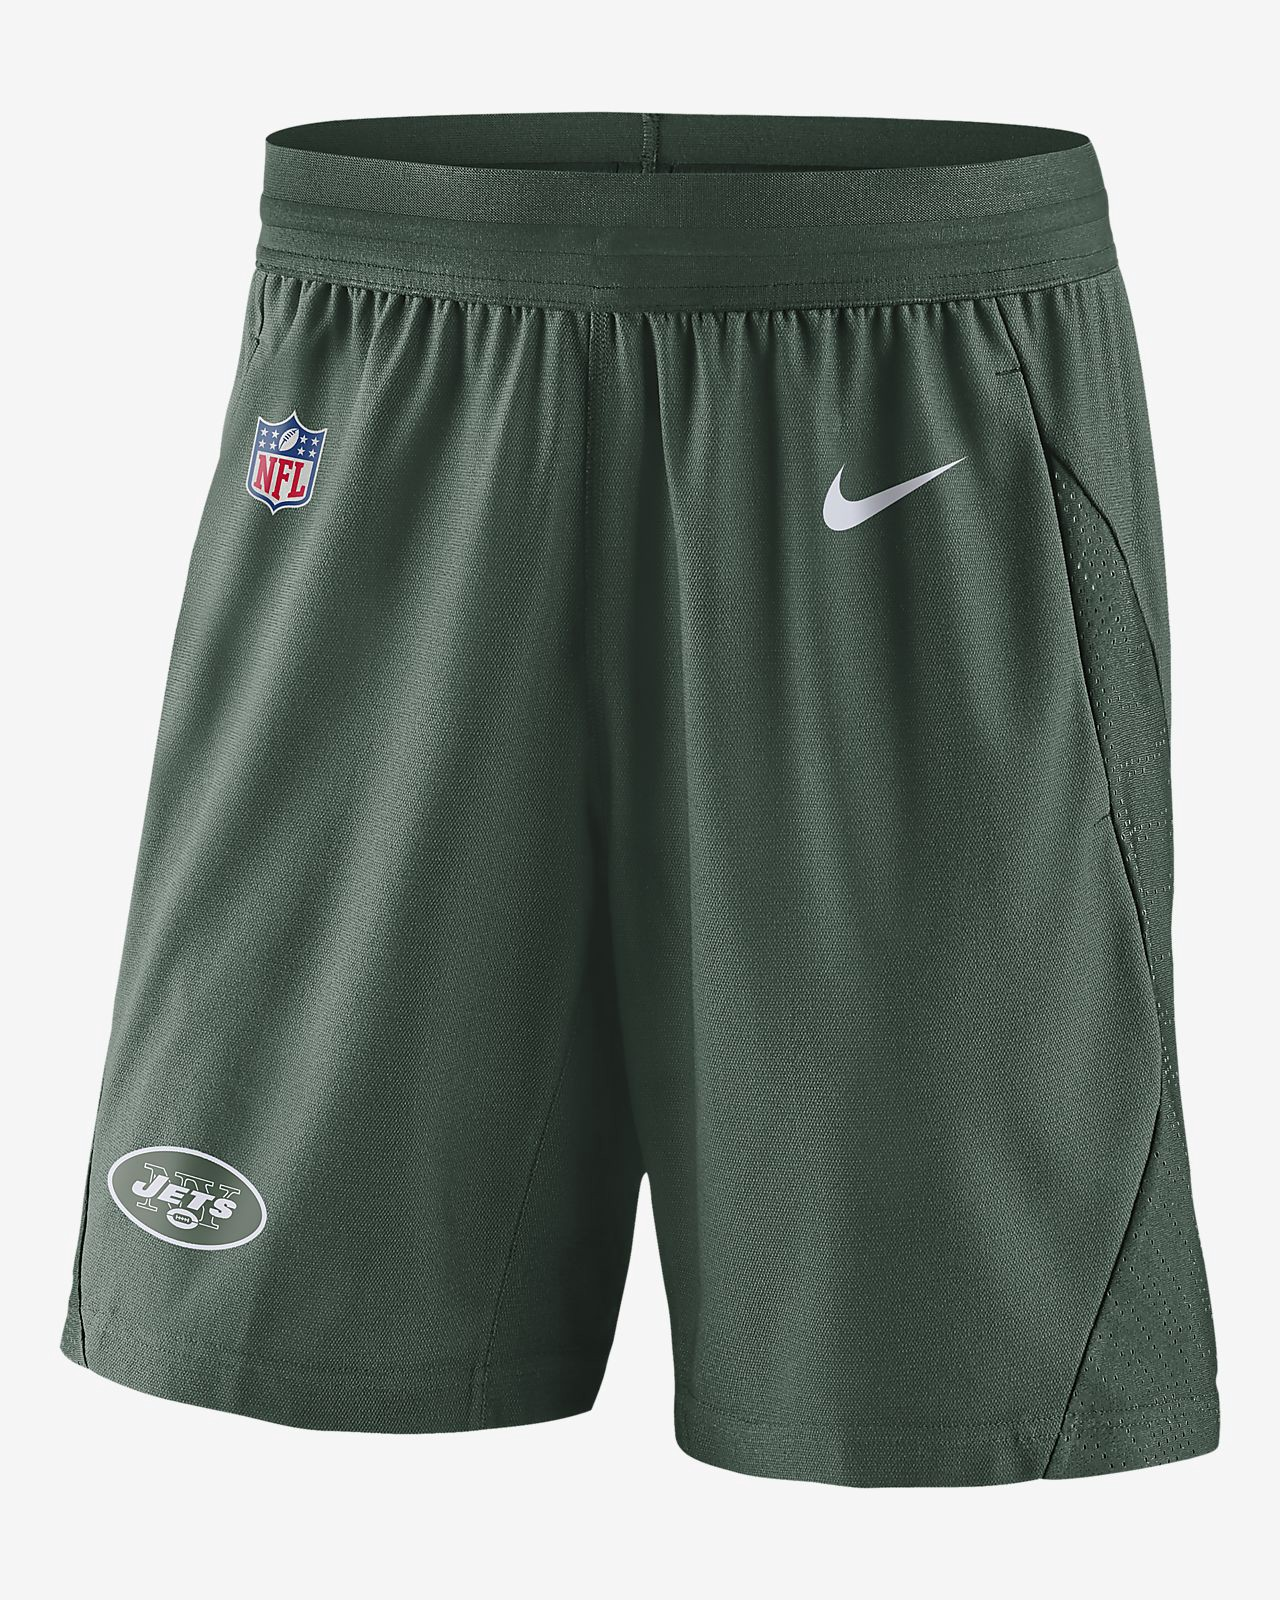 241e0741 Nike Dri-Fit Fly (Nfl Jets) Men's Knit Football Shorts - 3XL ...